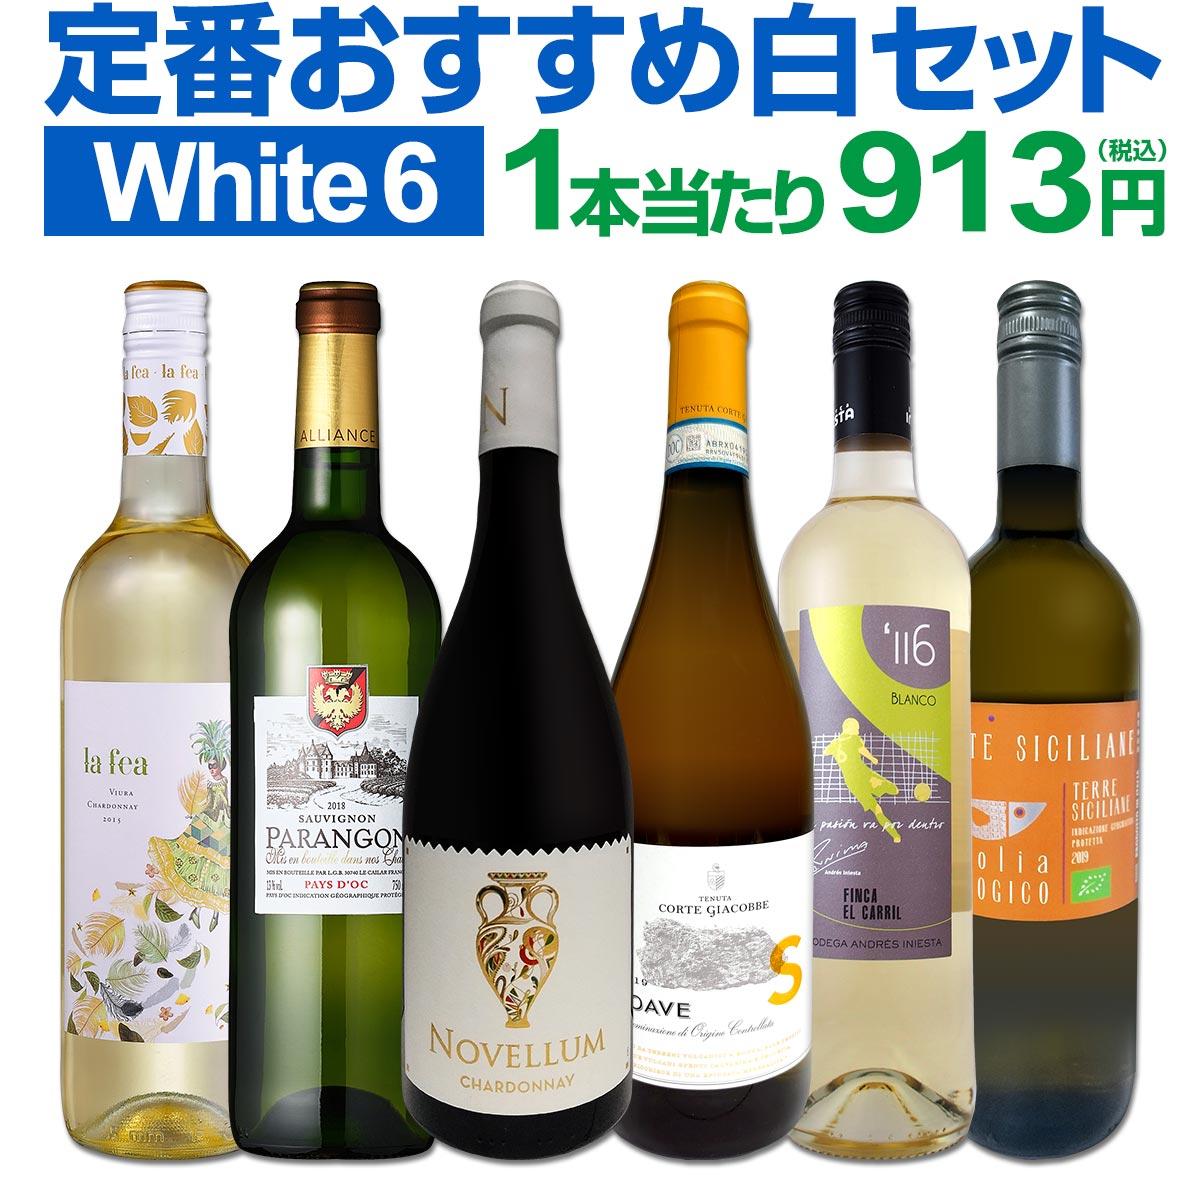 white6